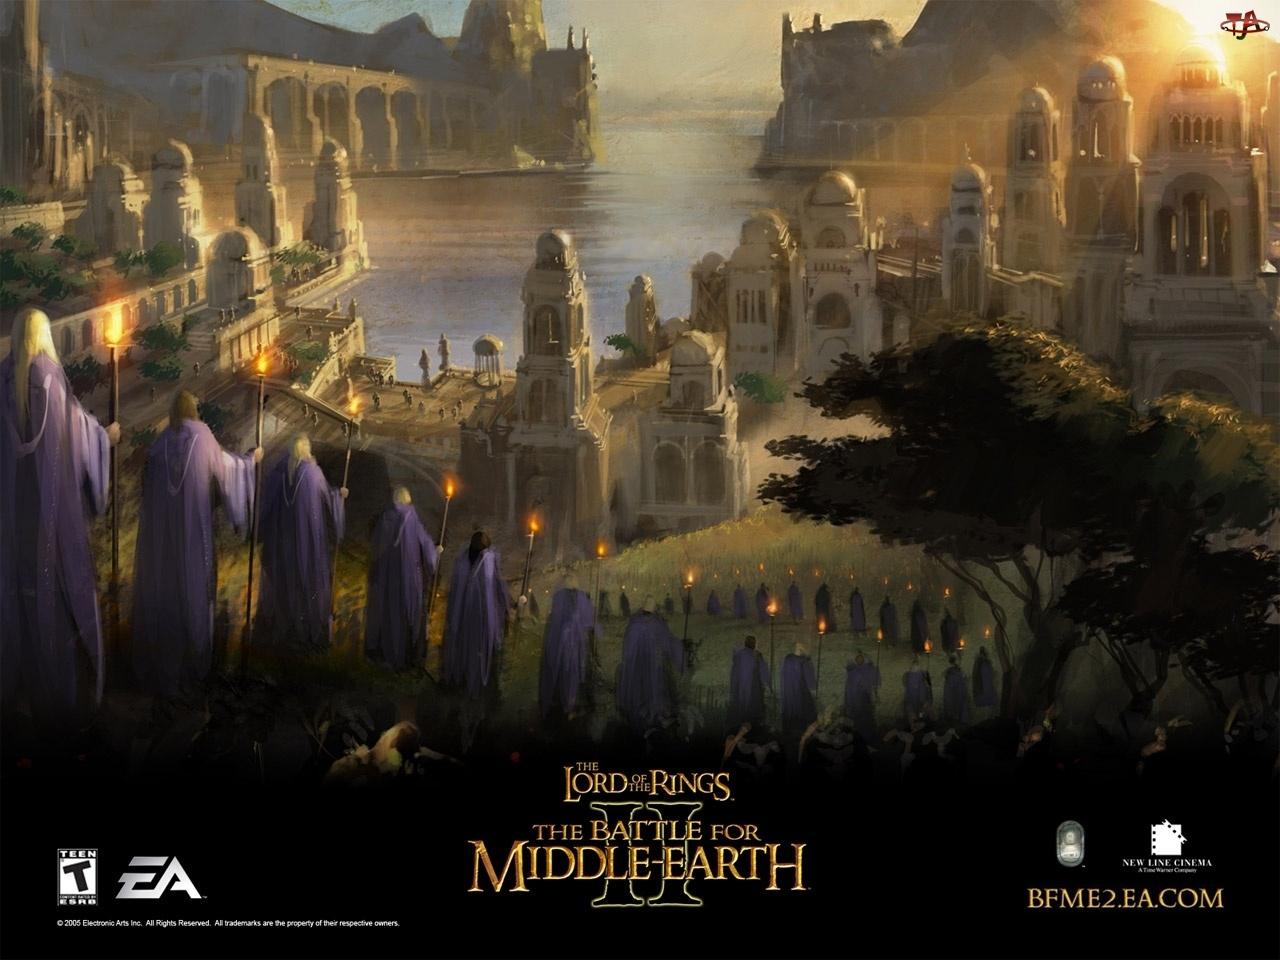 elfy, Lord of the Rings Botm 2, morze, miasto, postacie